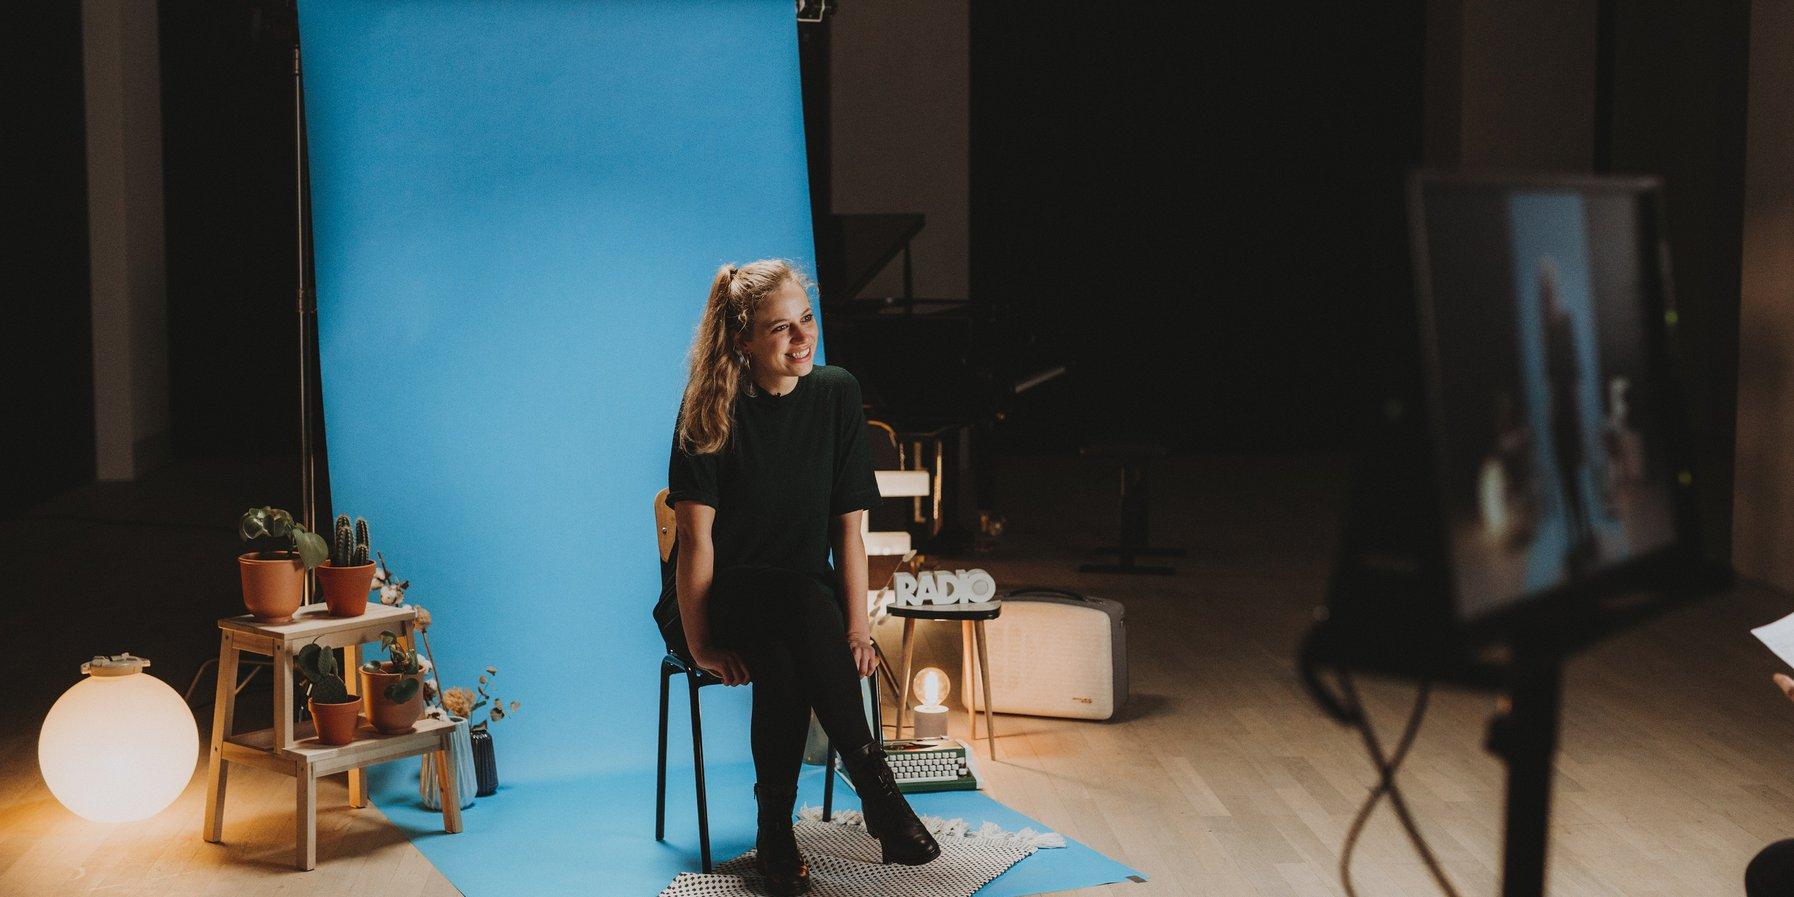 Vanessa Porter / Recording the interview